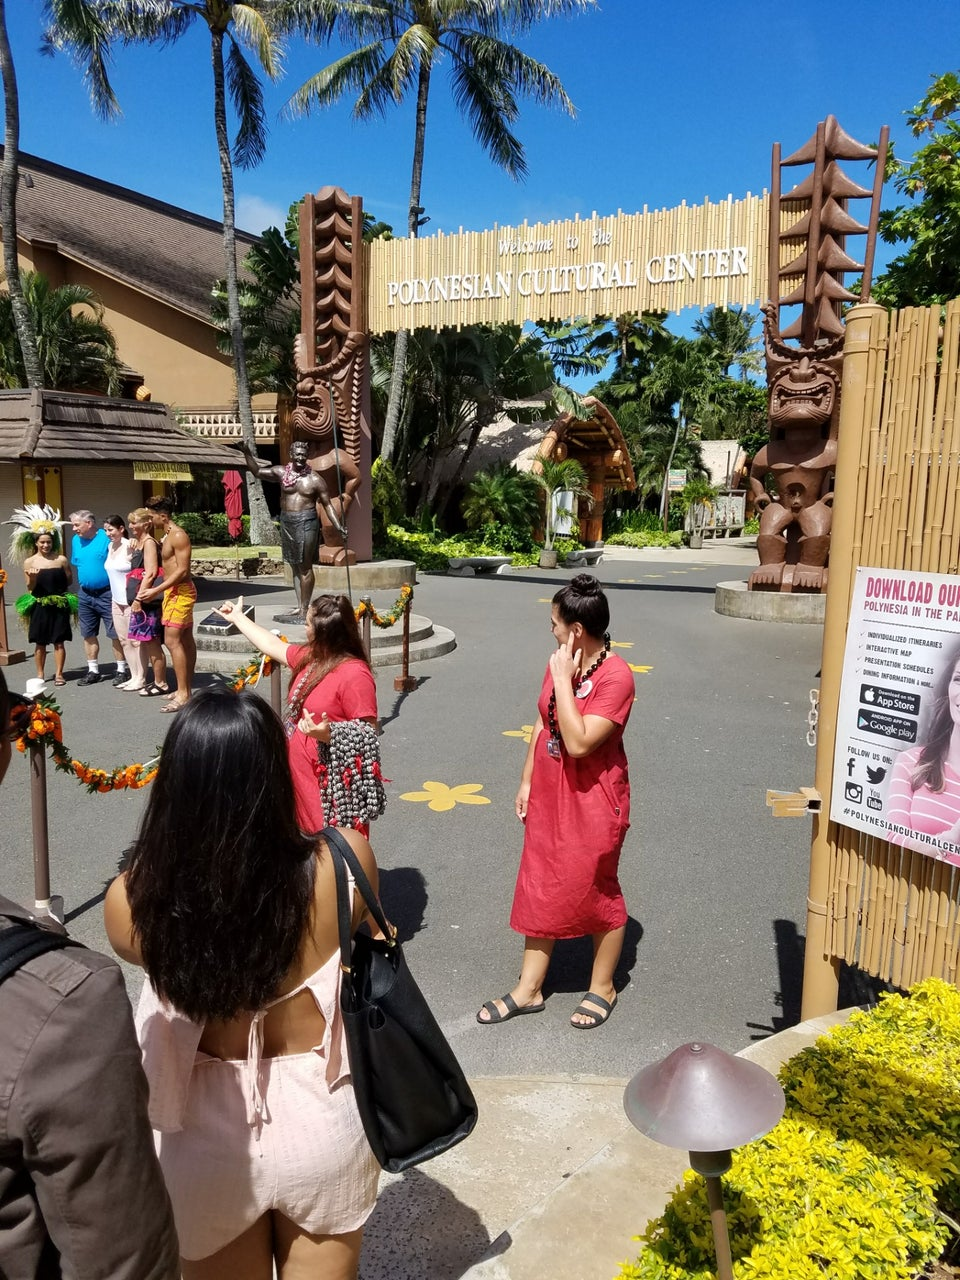 Photo of Polynesian Culture Center